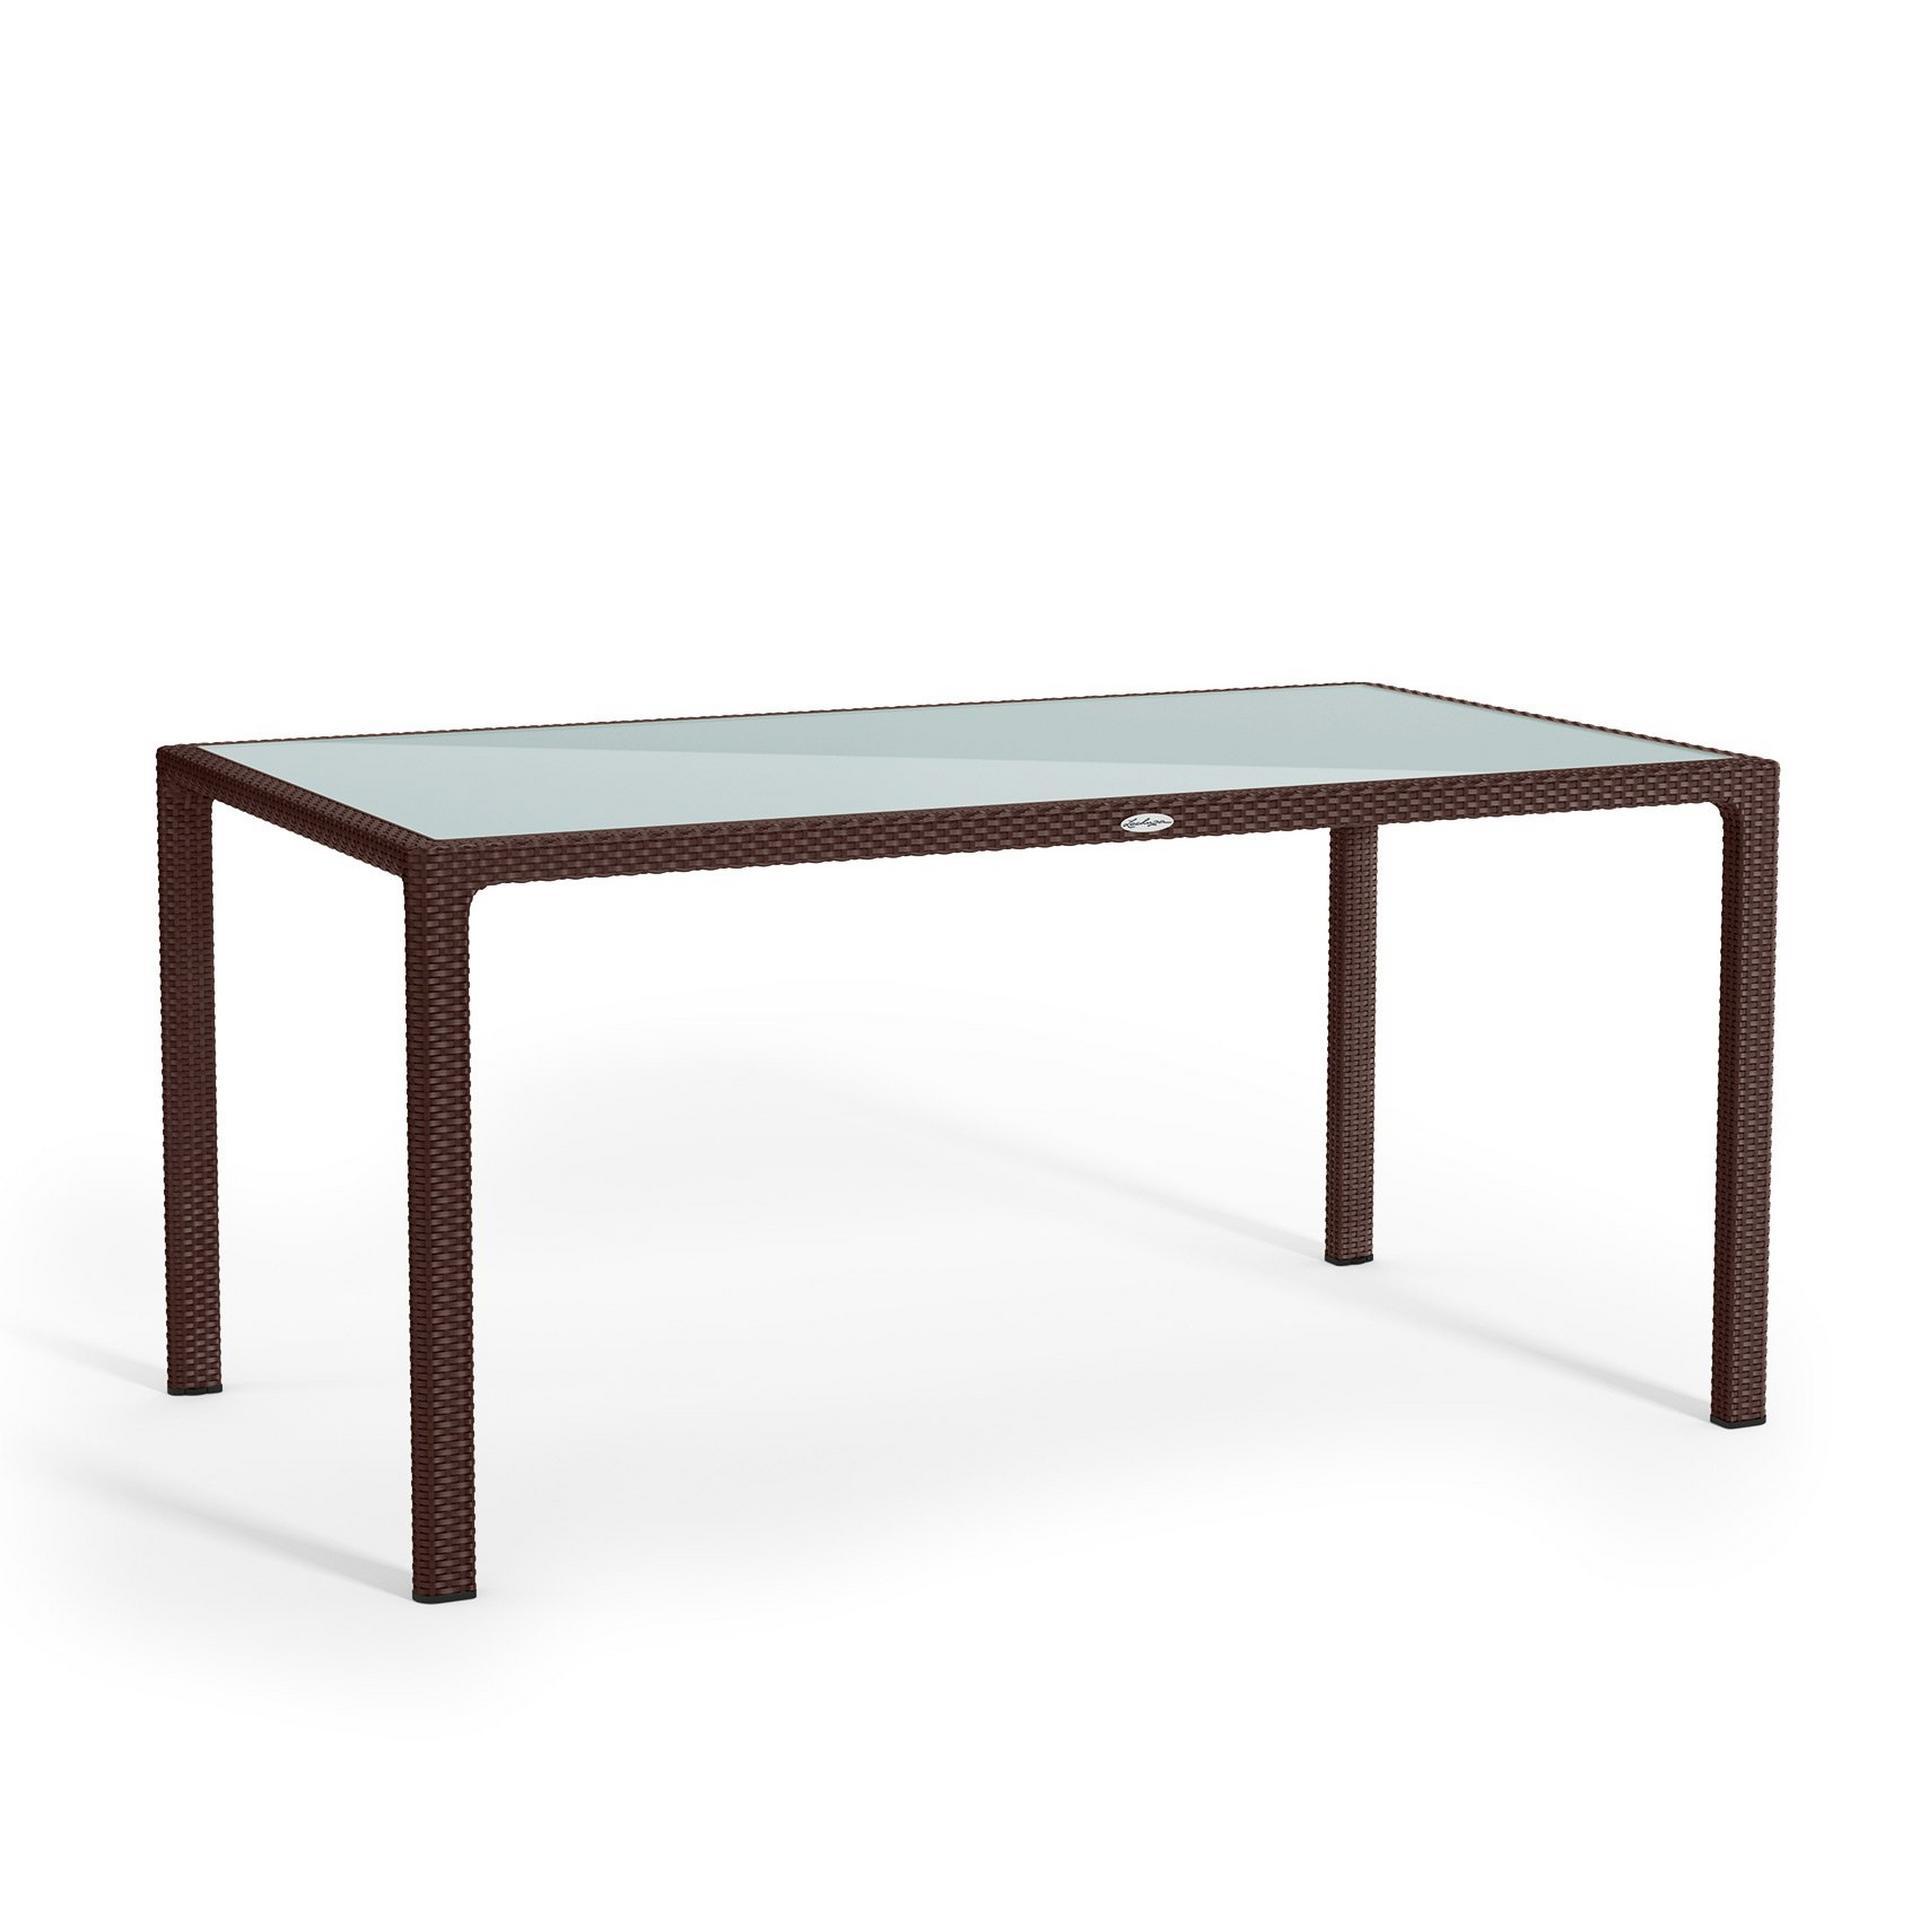 Large dining table mocha